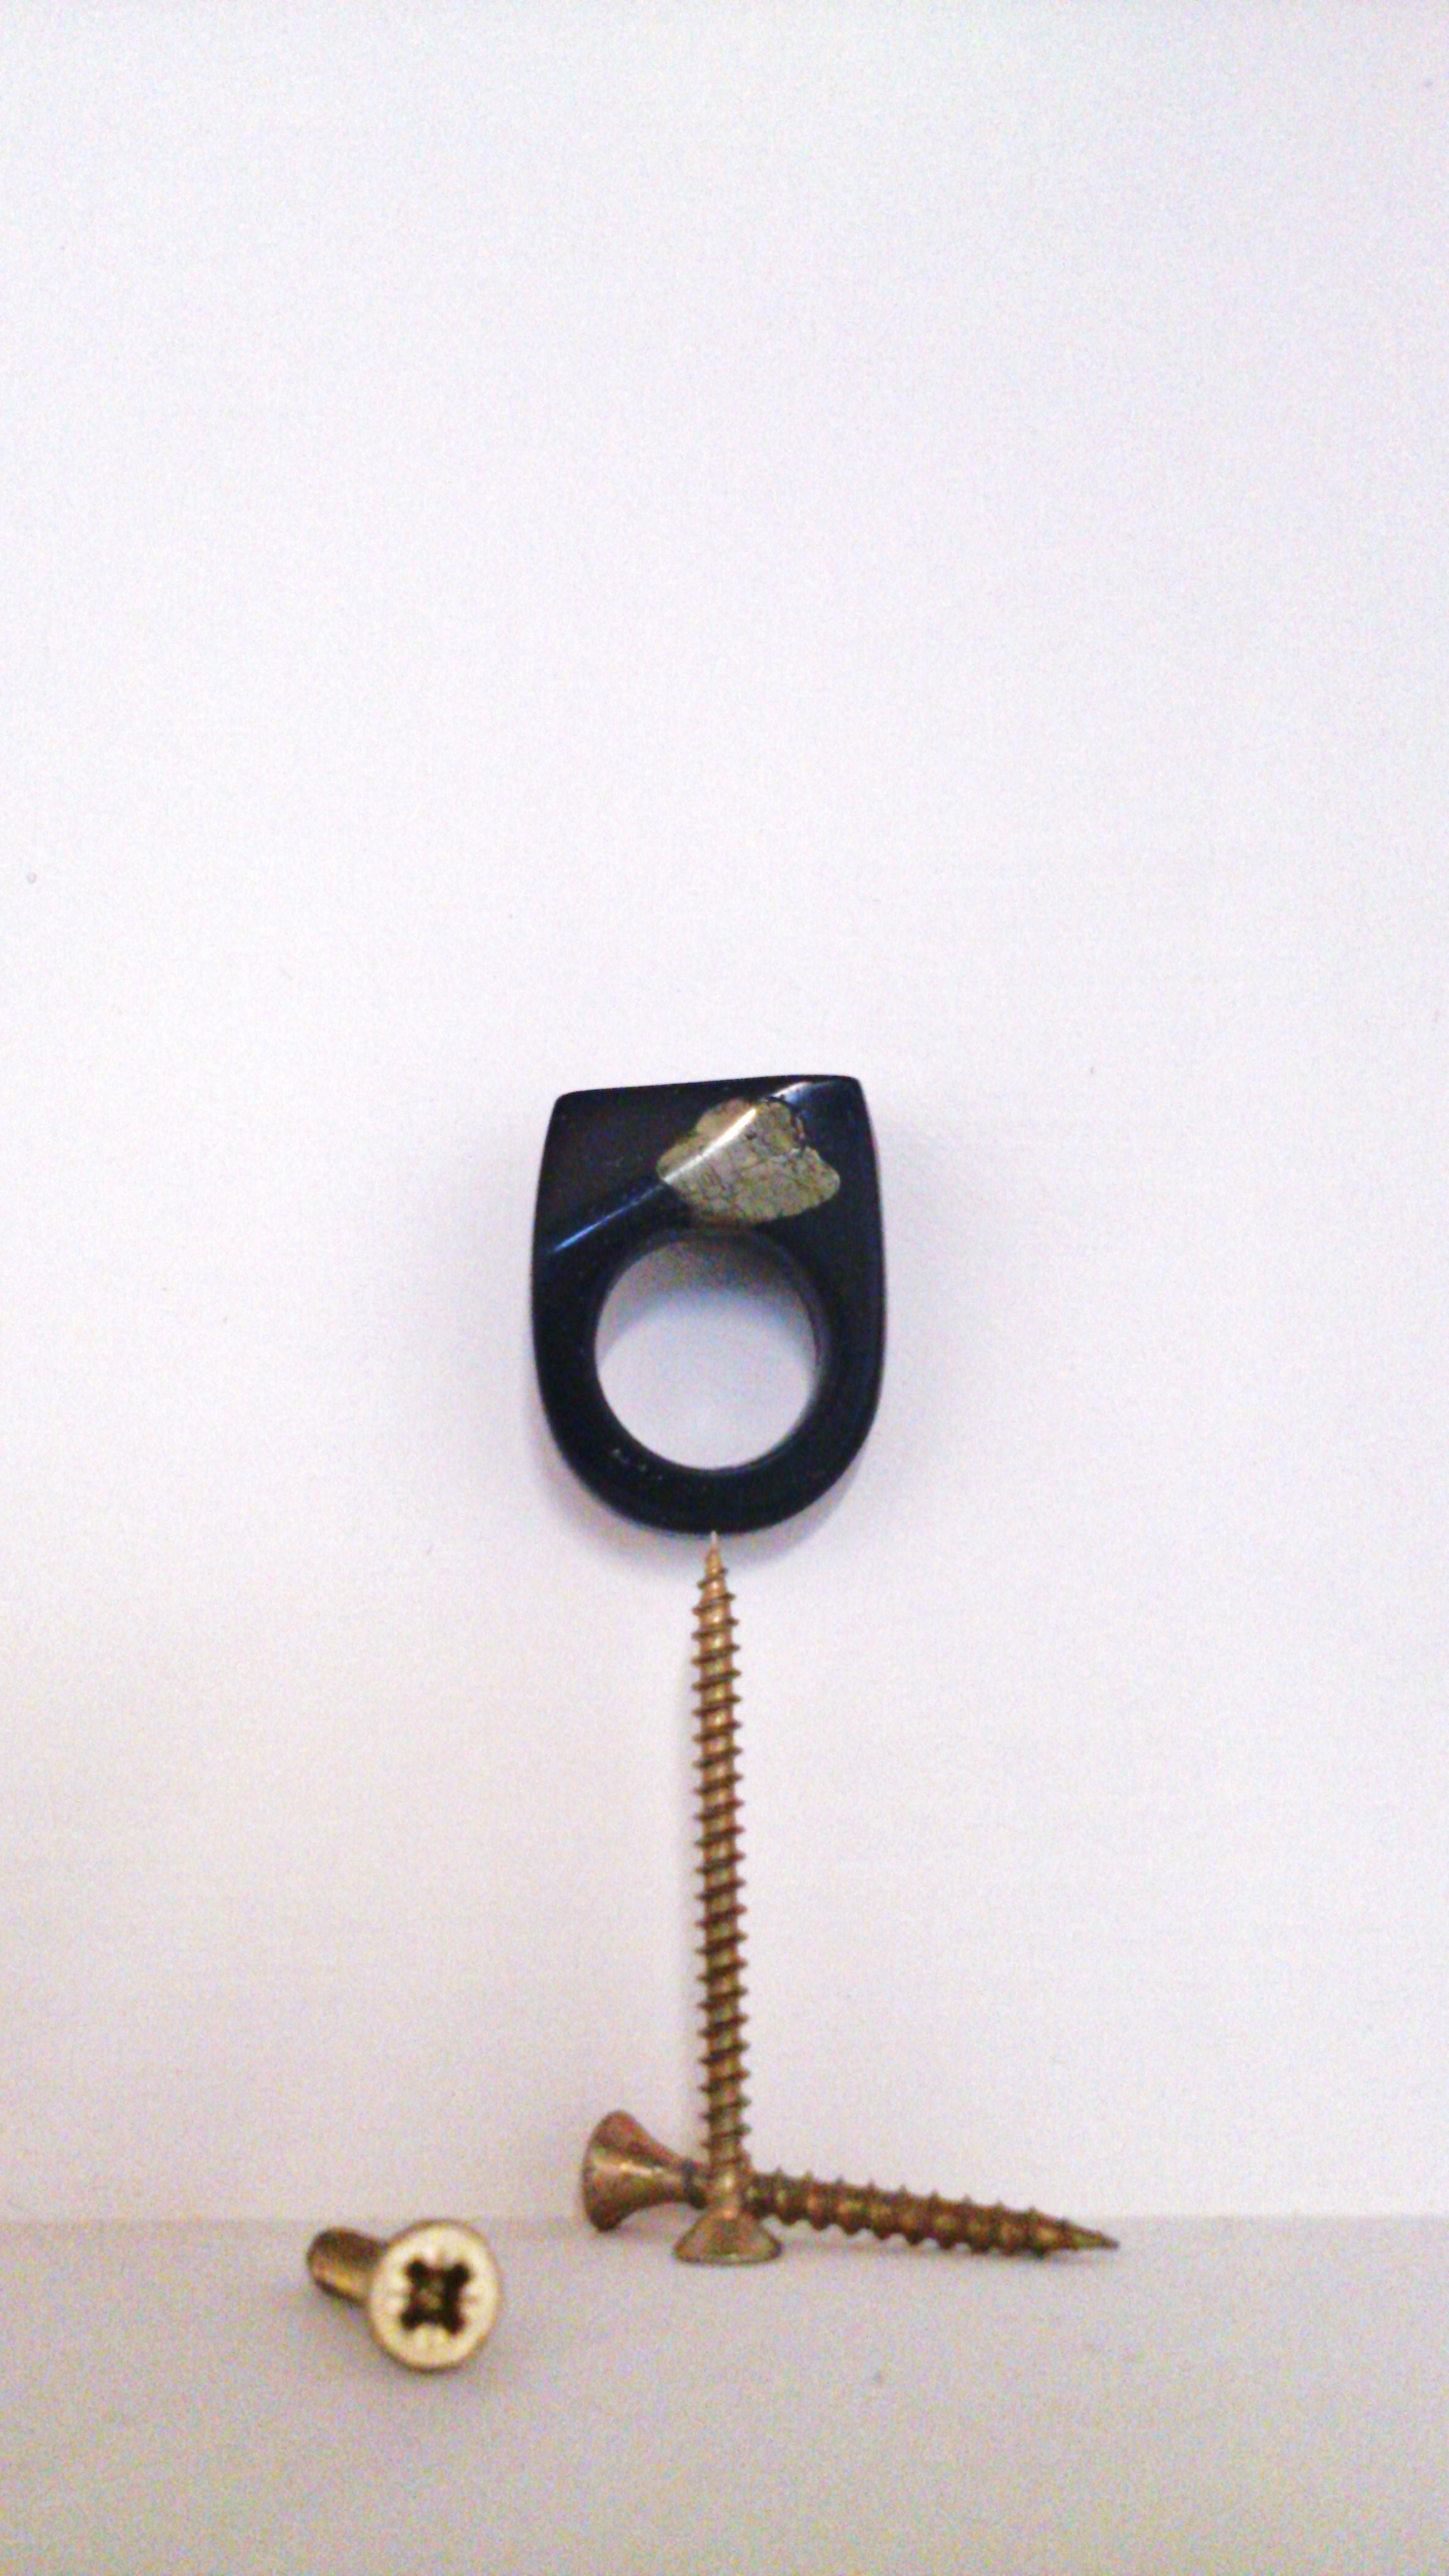 jade mellor hewn ring black pyrite screws.jpg